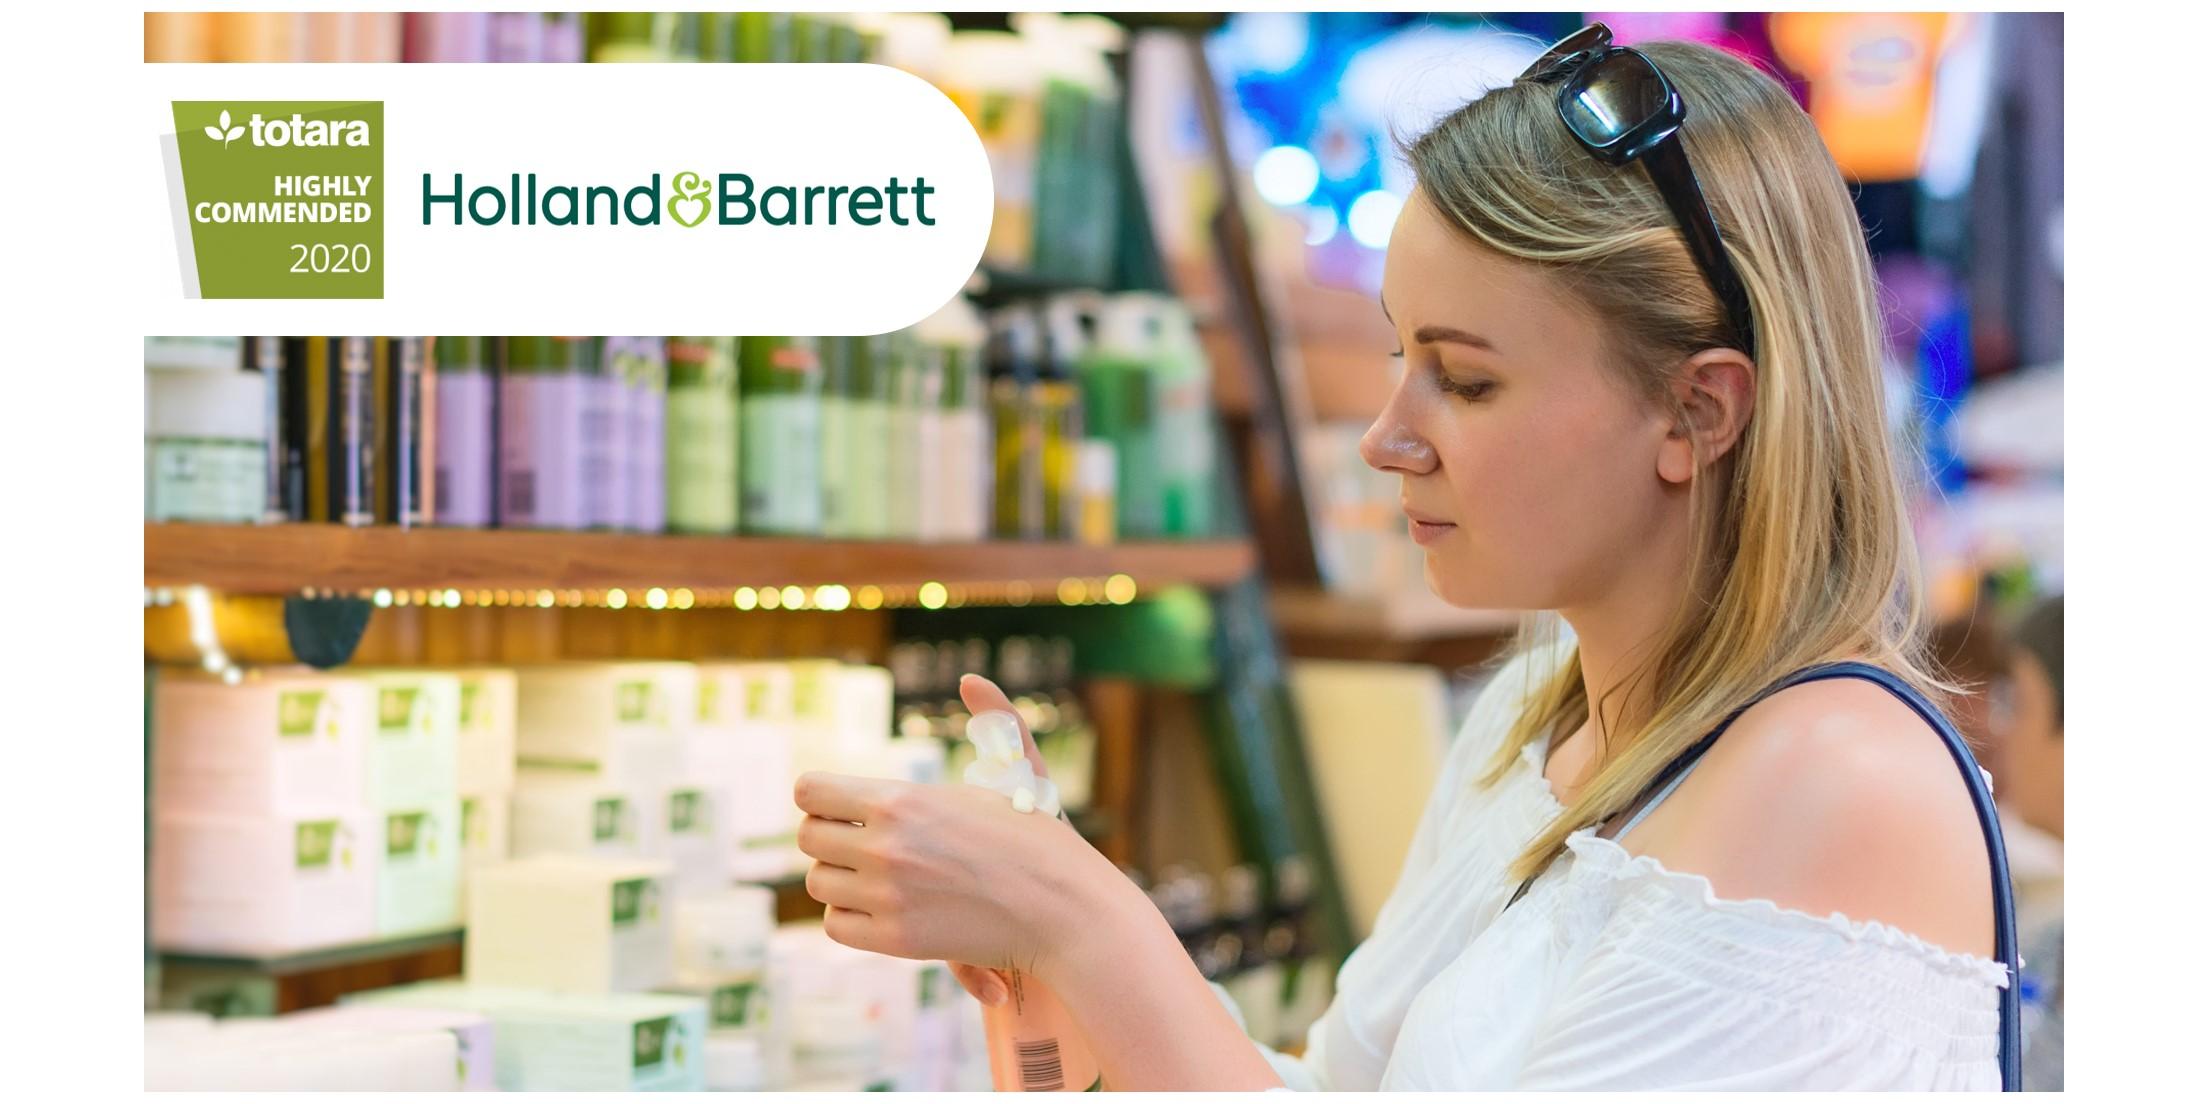 Our latest Totara success story: Holland & Barrett